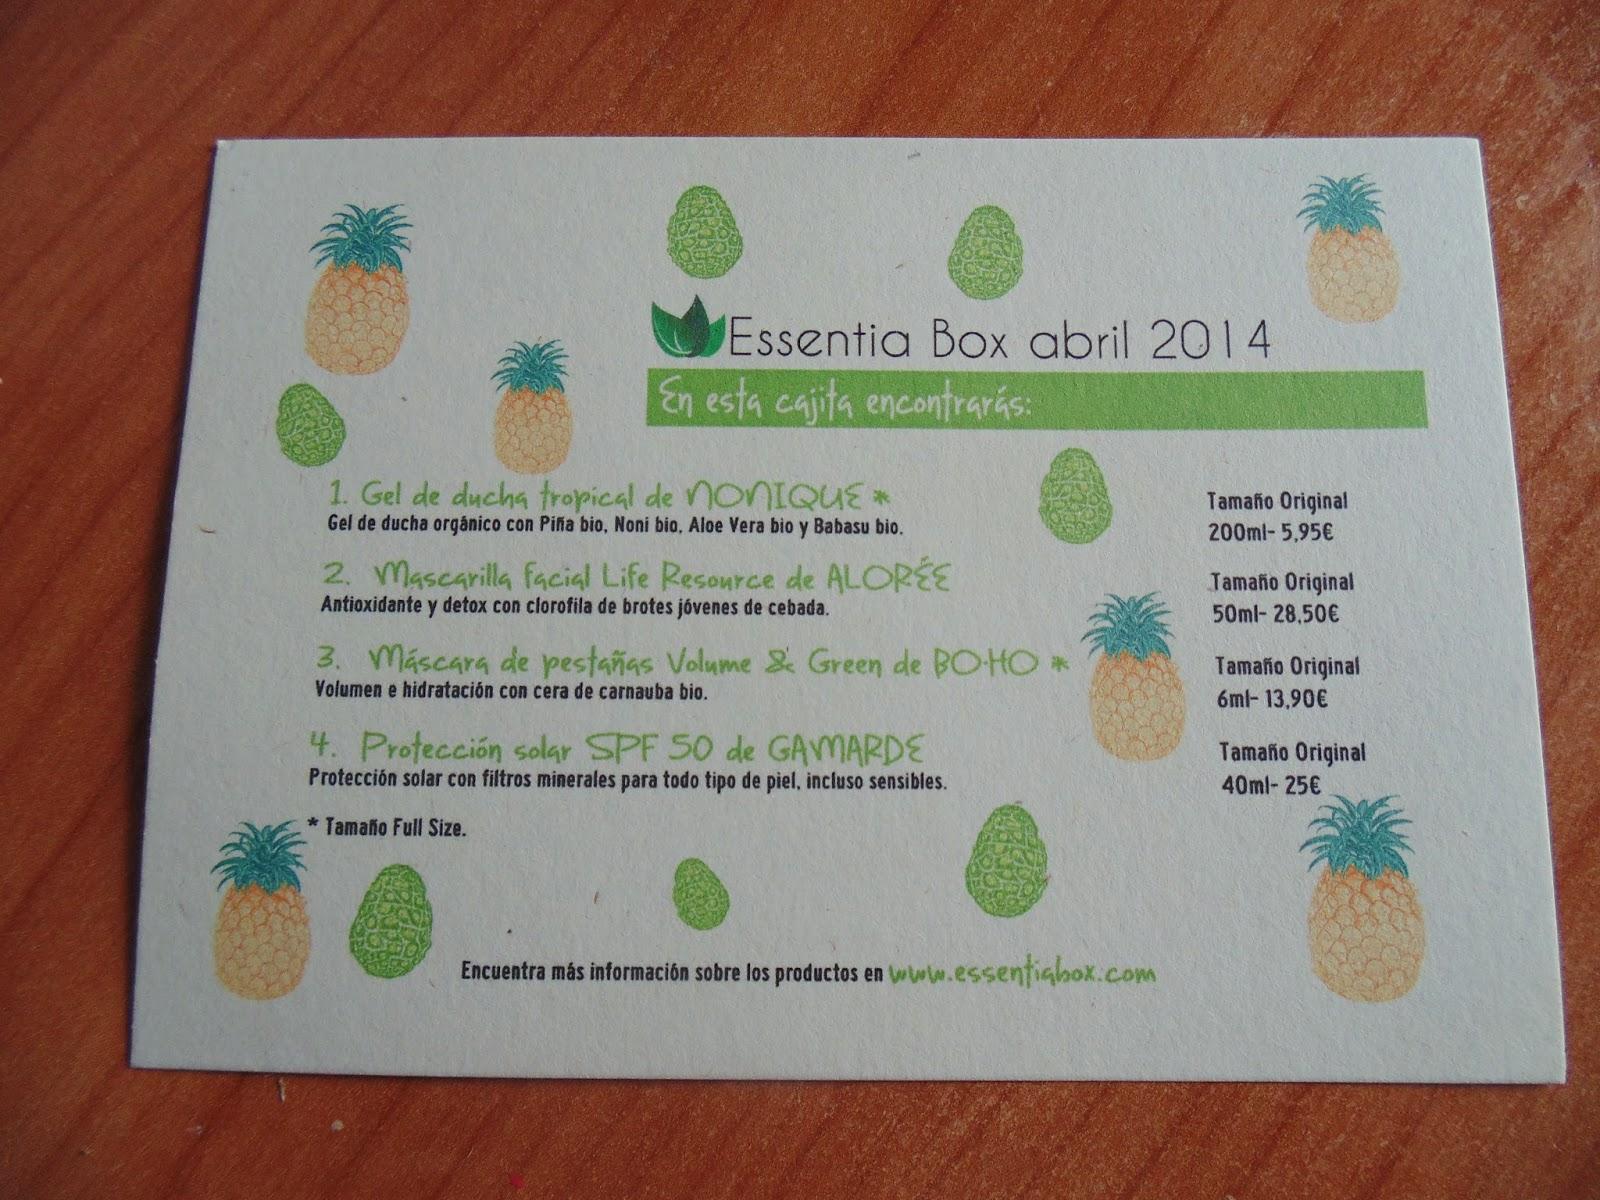 Essentia Box Abril 3